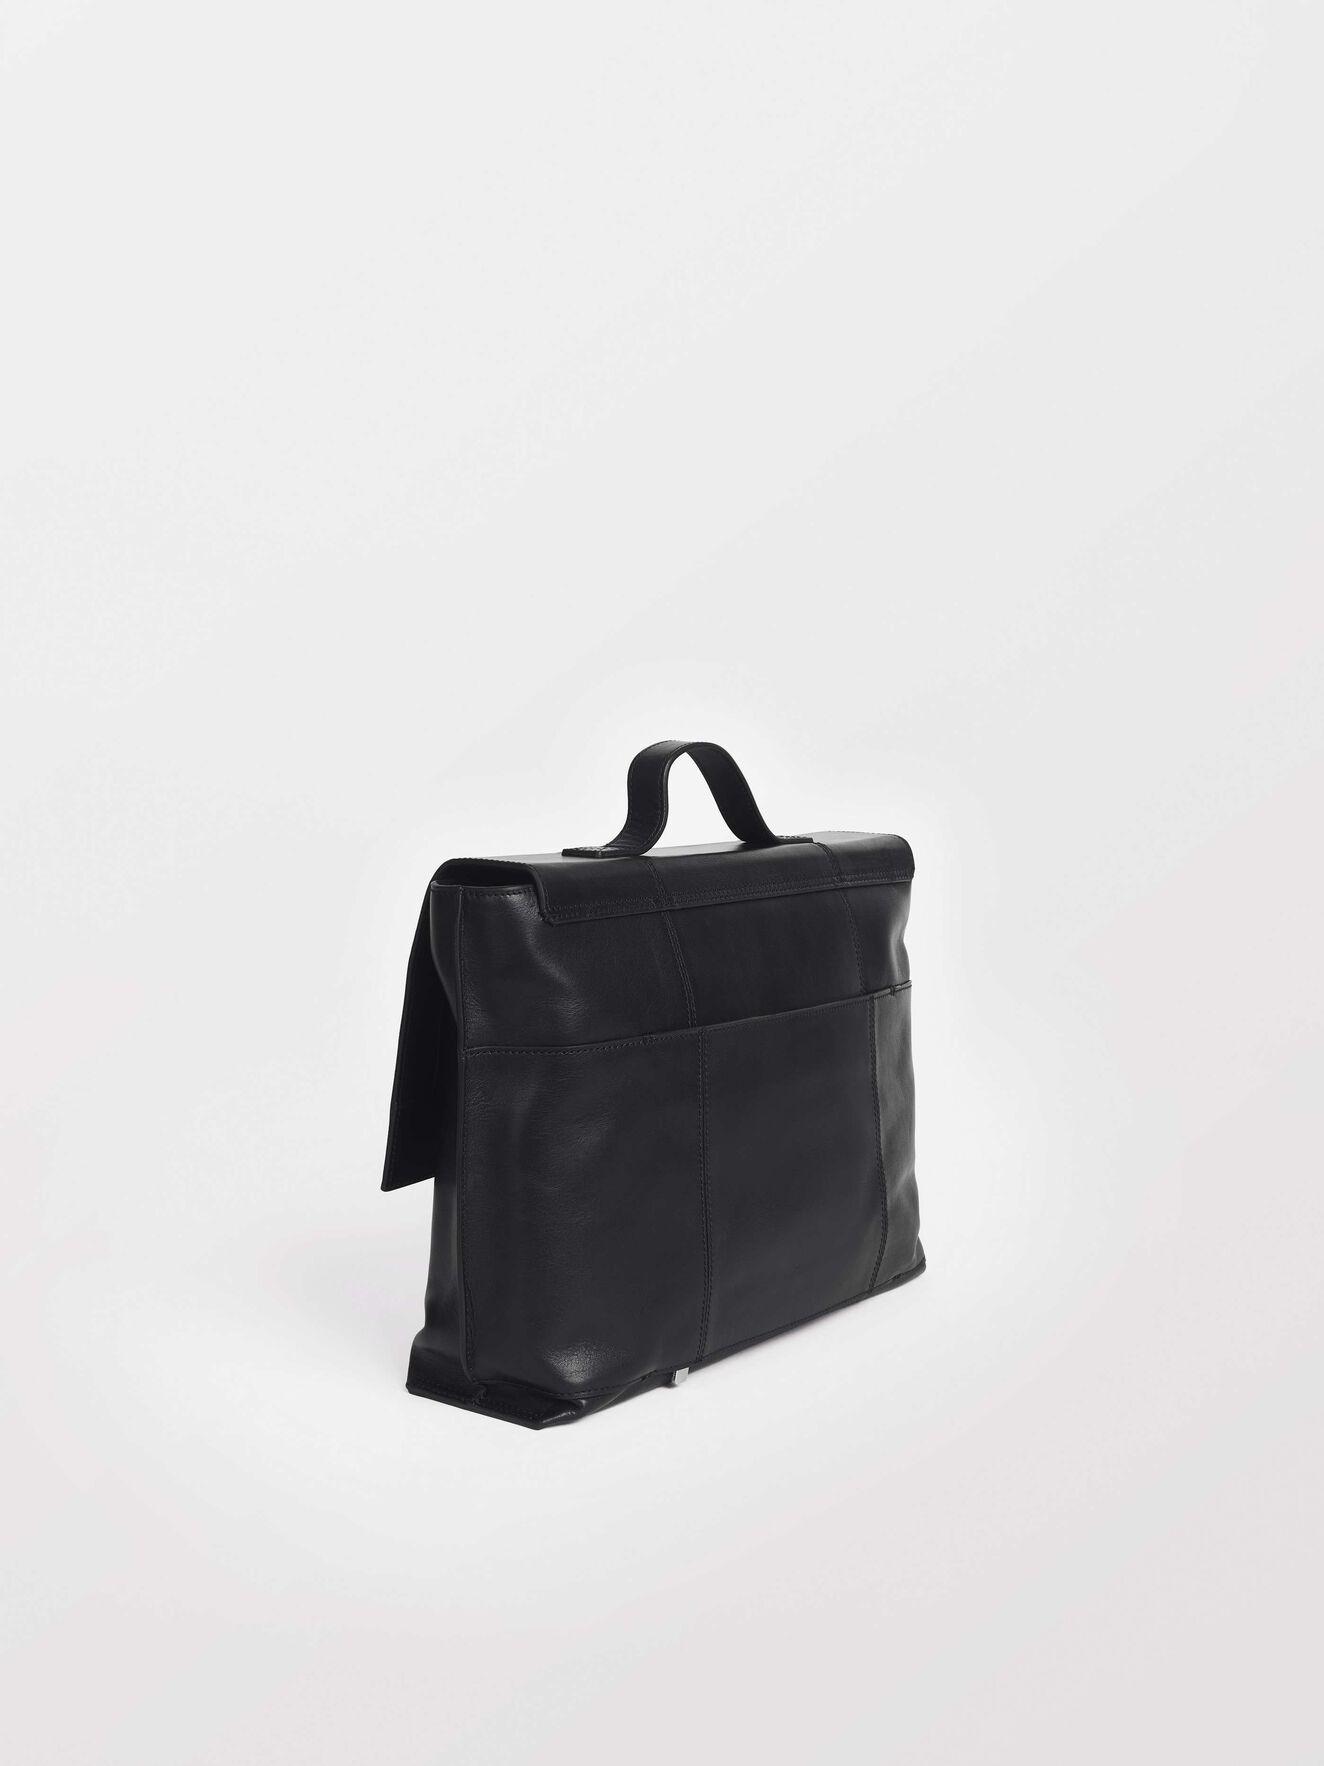 Vasatana 2 Bag in Black from Tiger of Sweden